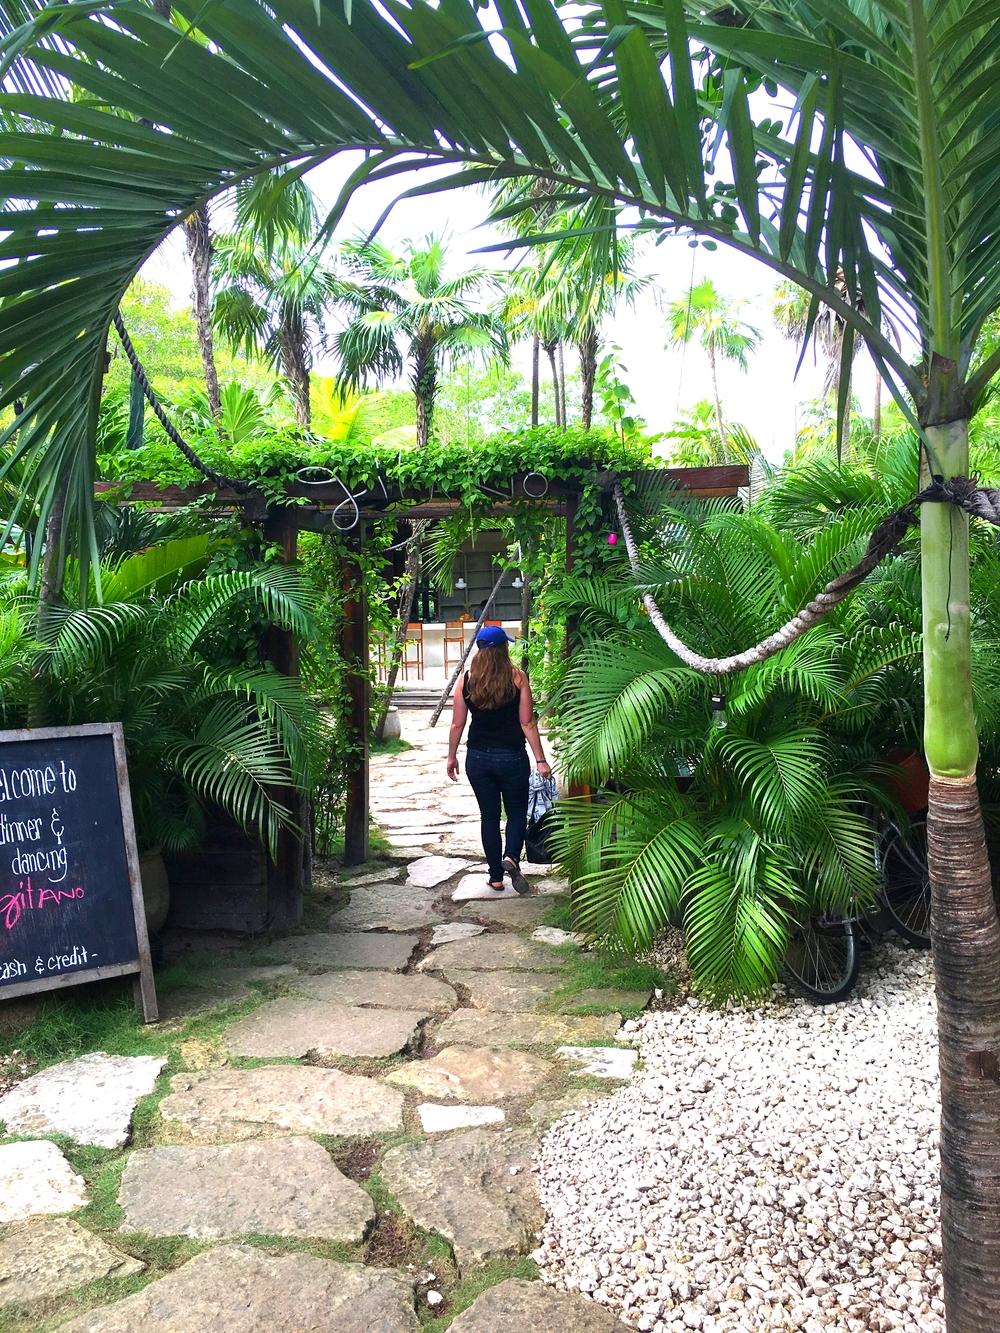 Entrance to Gitano - my favorite spot!